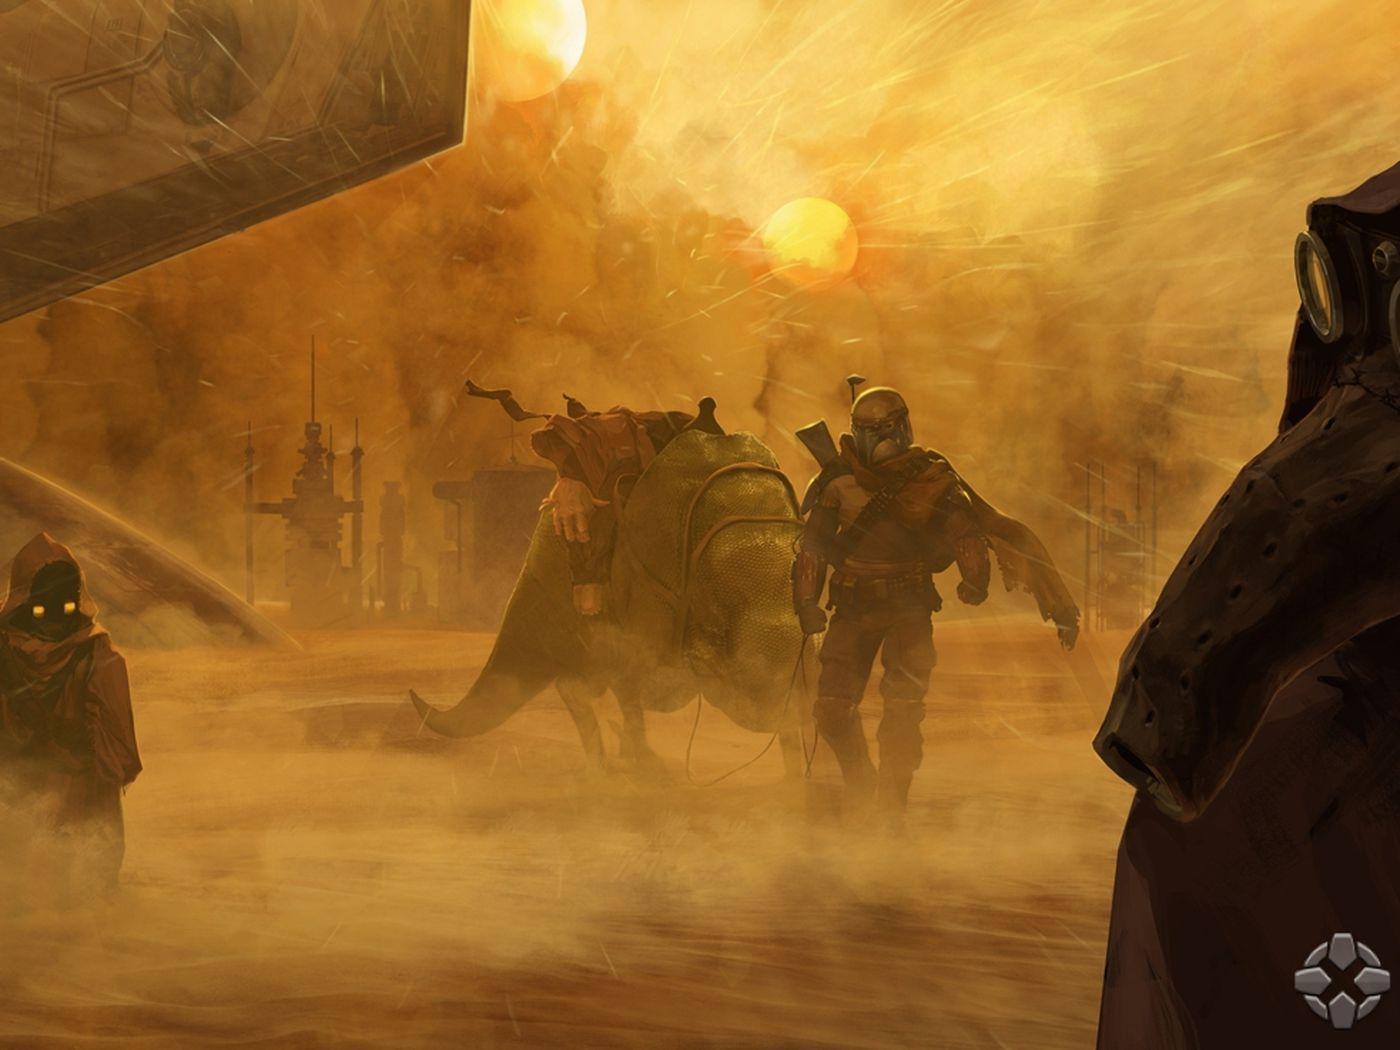 Star Wars 1313 Concept Art Demo Detail Story Starring Boba Fett Polygon